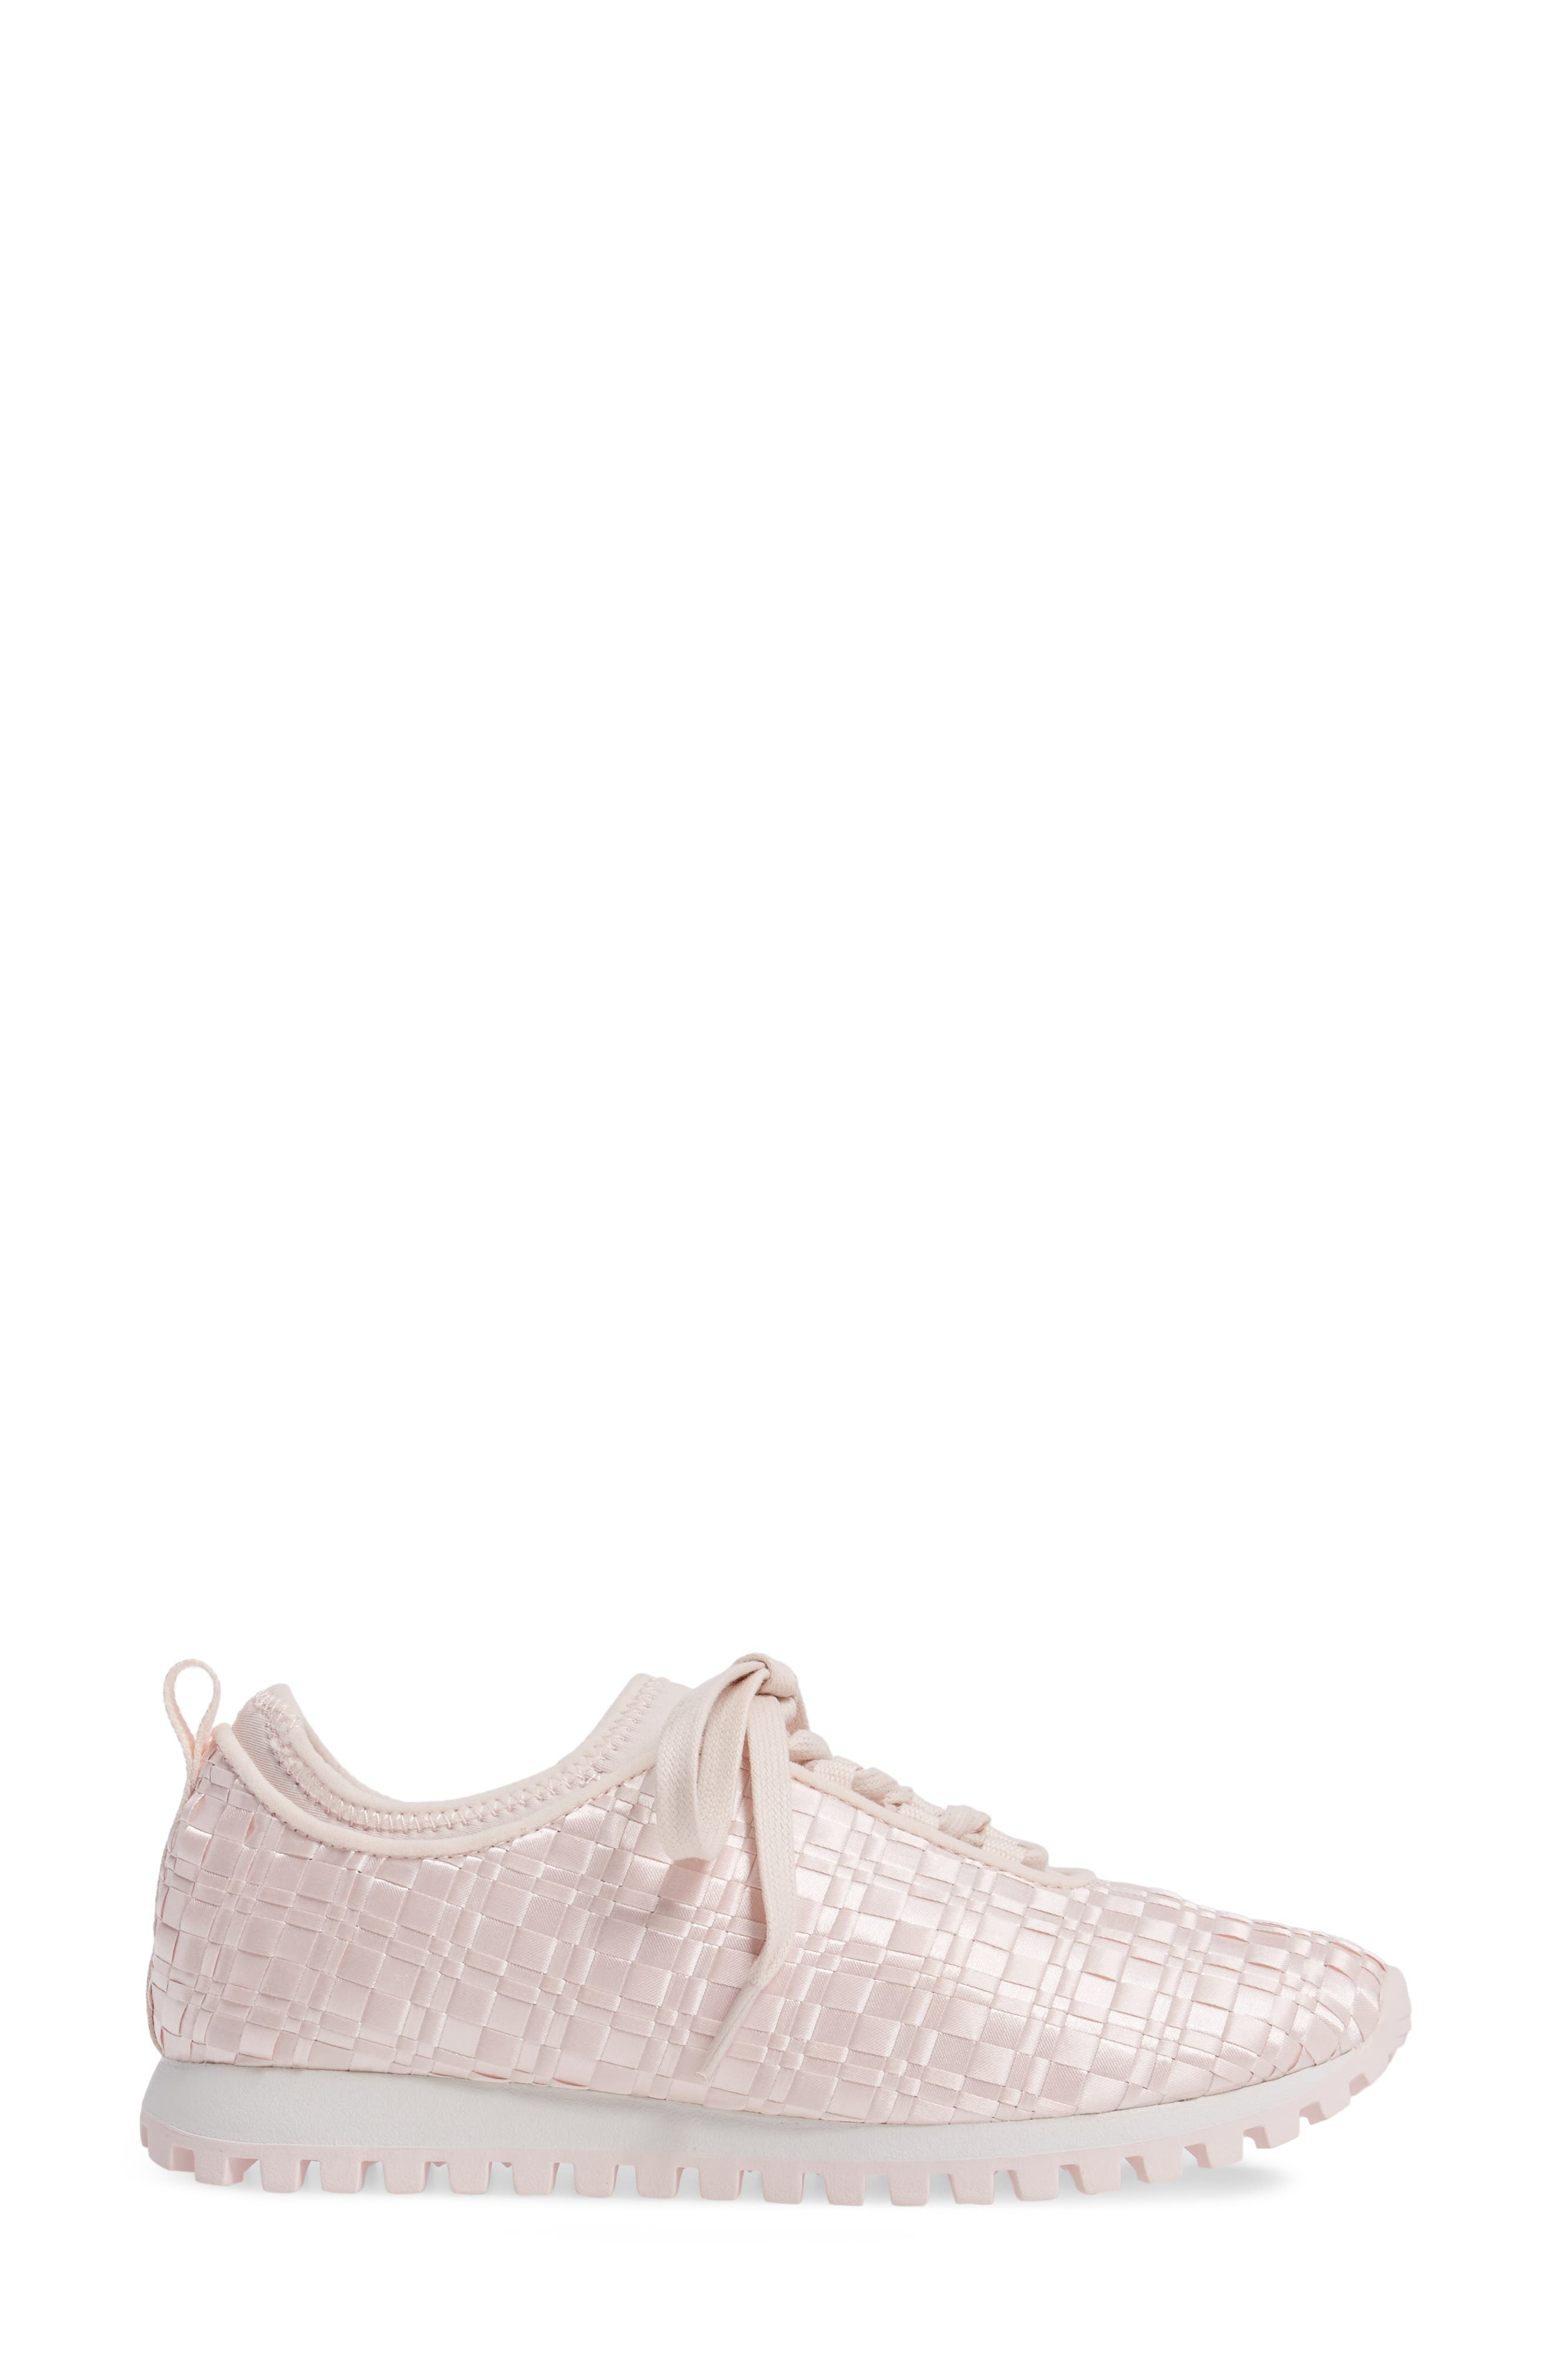 Lynn Sock Fit Woven Sneaker,                             Alternate thumbnail 3, color,                             Dusty Rose